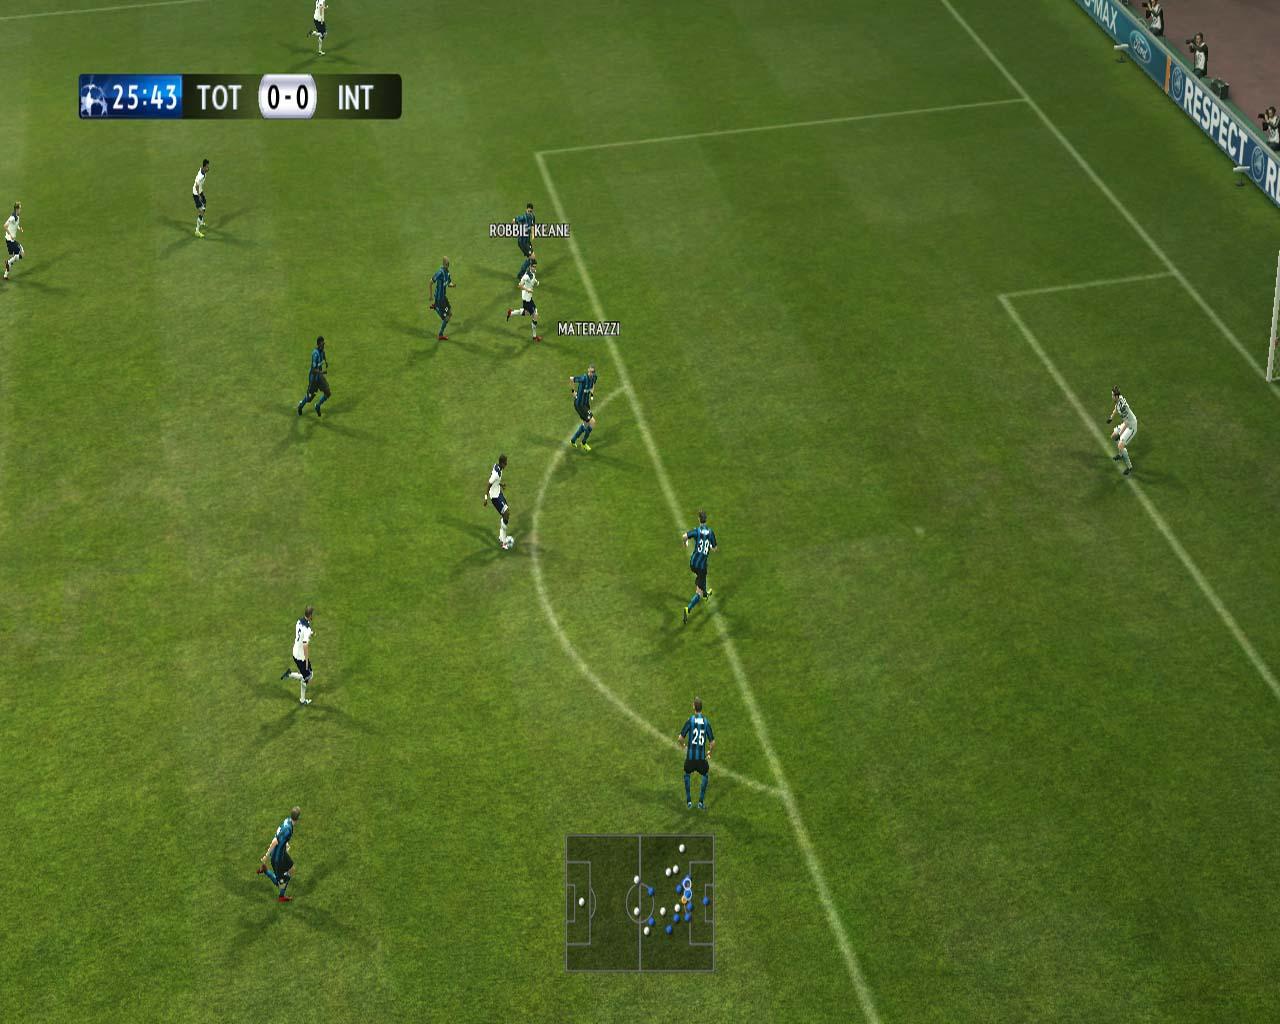 Pro Evolution Soccer 2011 - král je mrtev? 23557